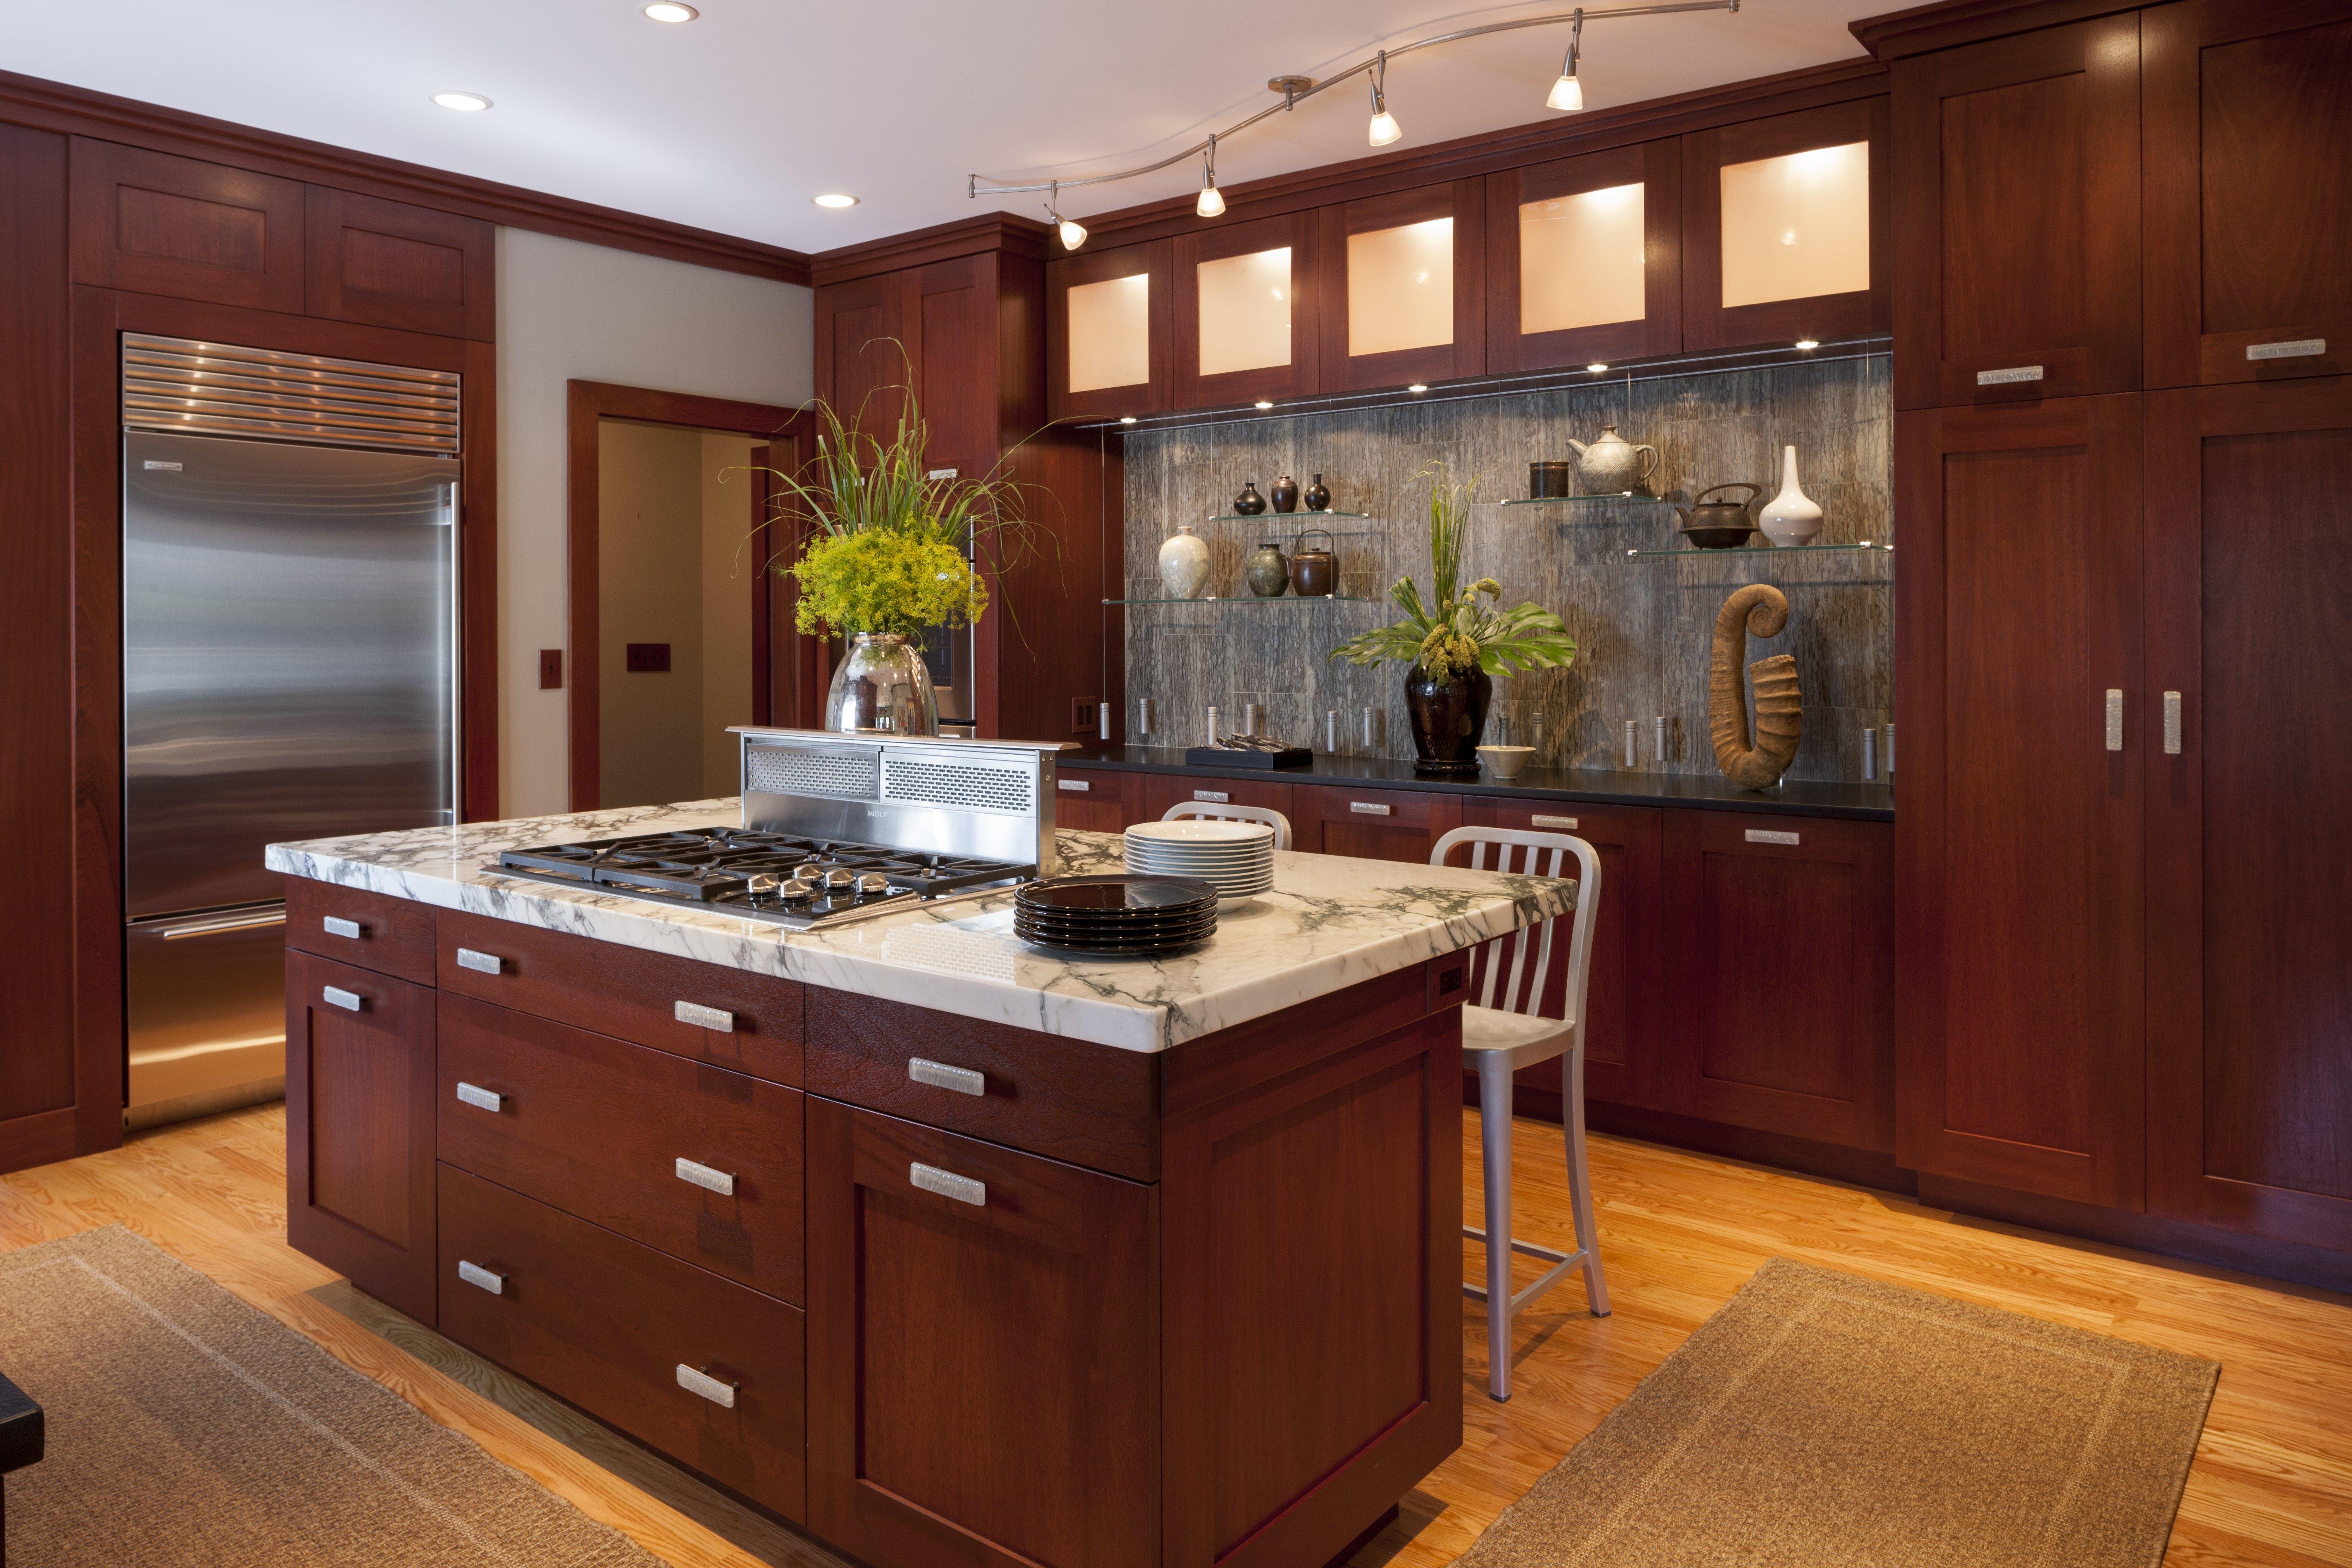 This Kitchen Designed By Boston Interior Designer Elizabeth Swartz Interiors Features Layered Lighting That Utilizes